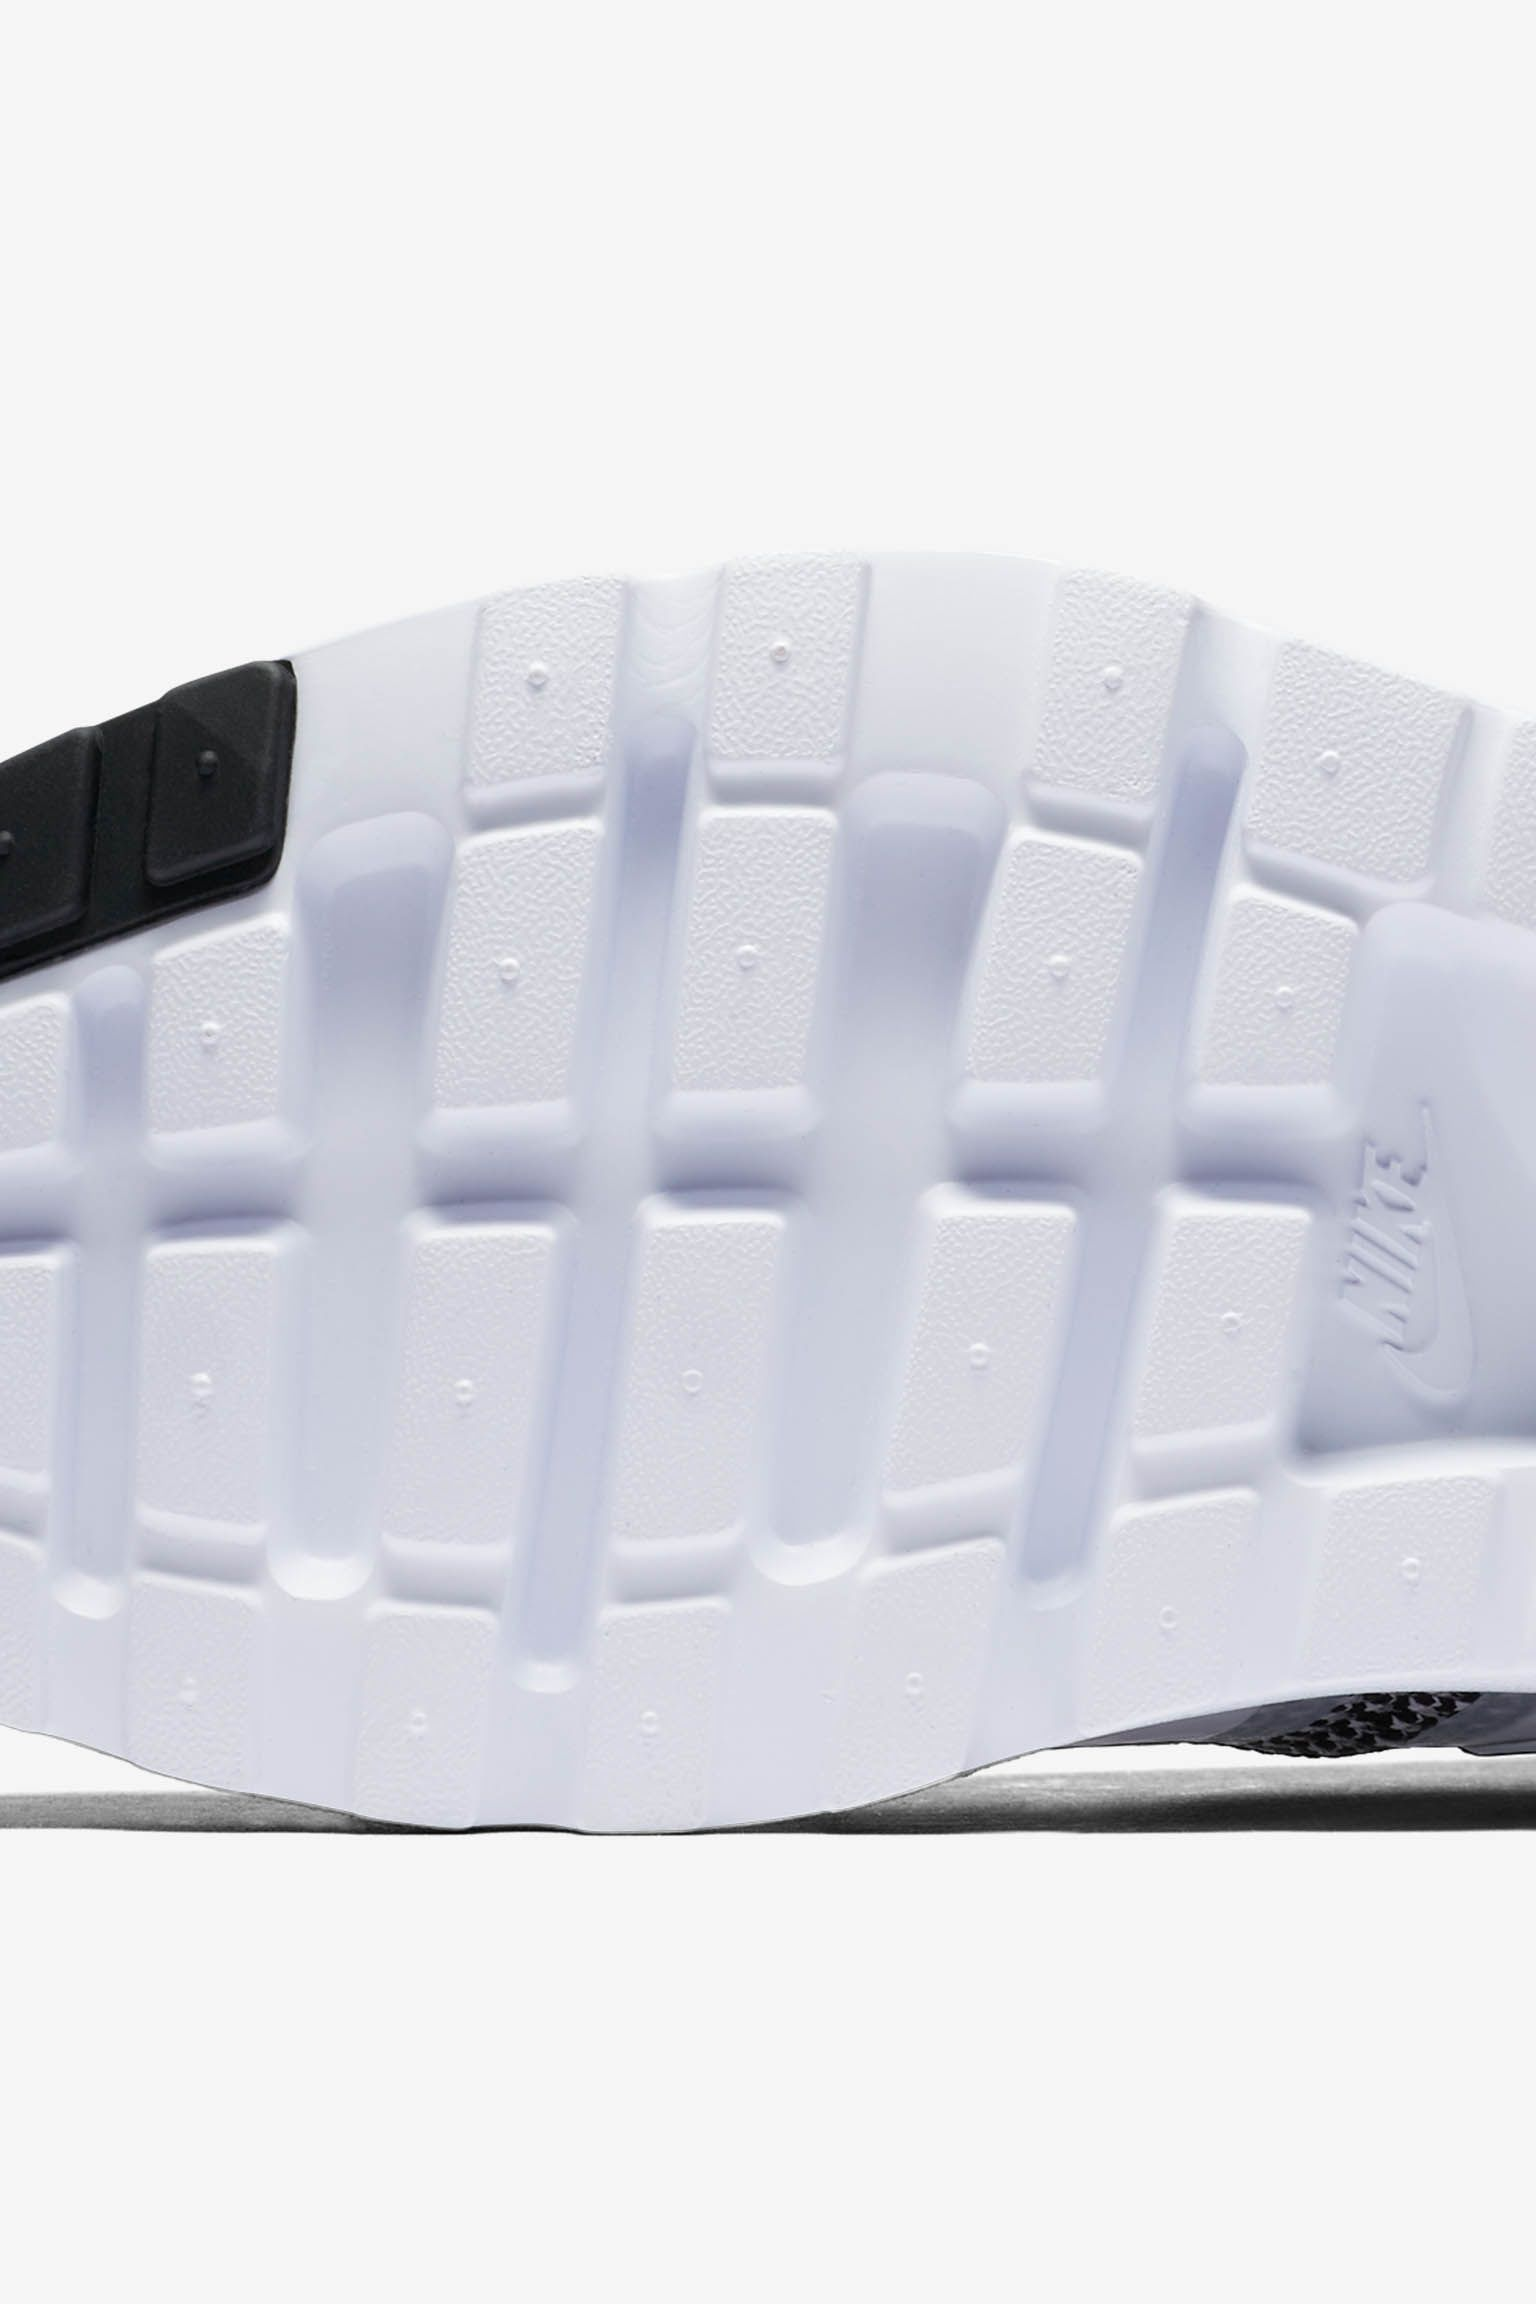 Nike Air Max Zero 'Wolf Grey & Black'